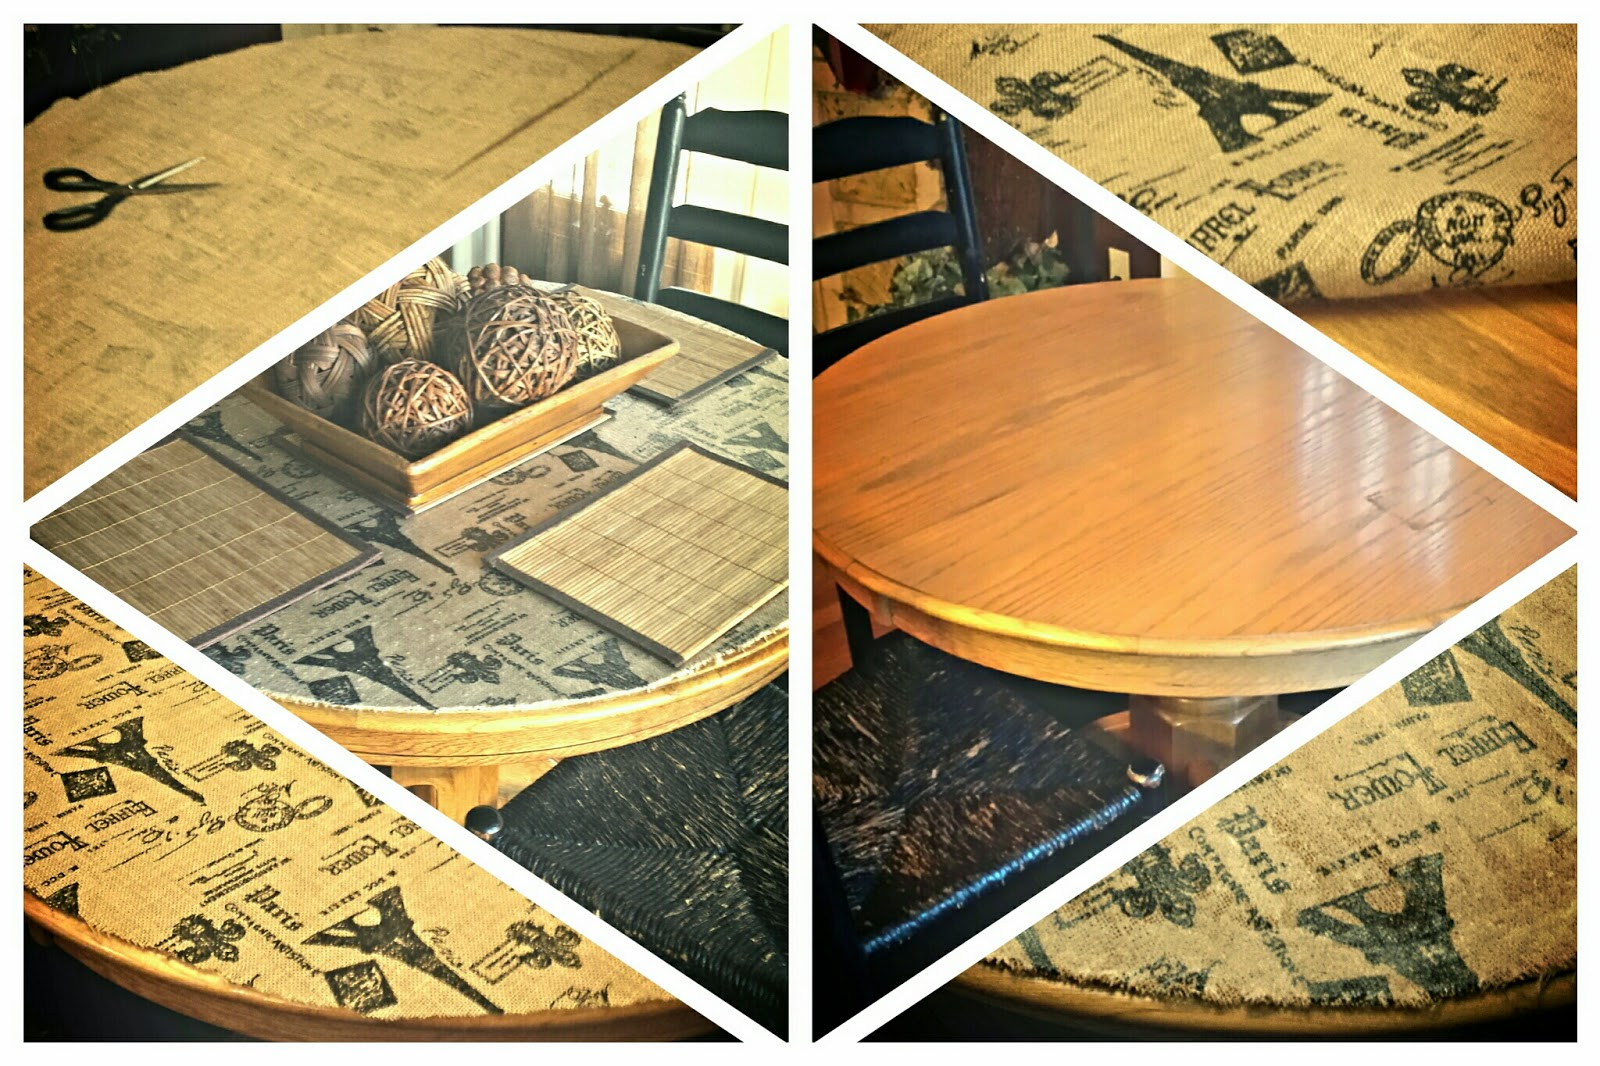 Mod Podge Kitchen Table The Junker Shop Kitchen Table Fabric Mod Podge